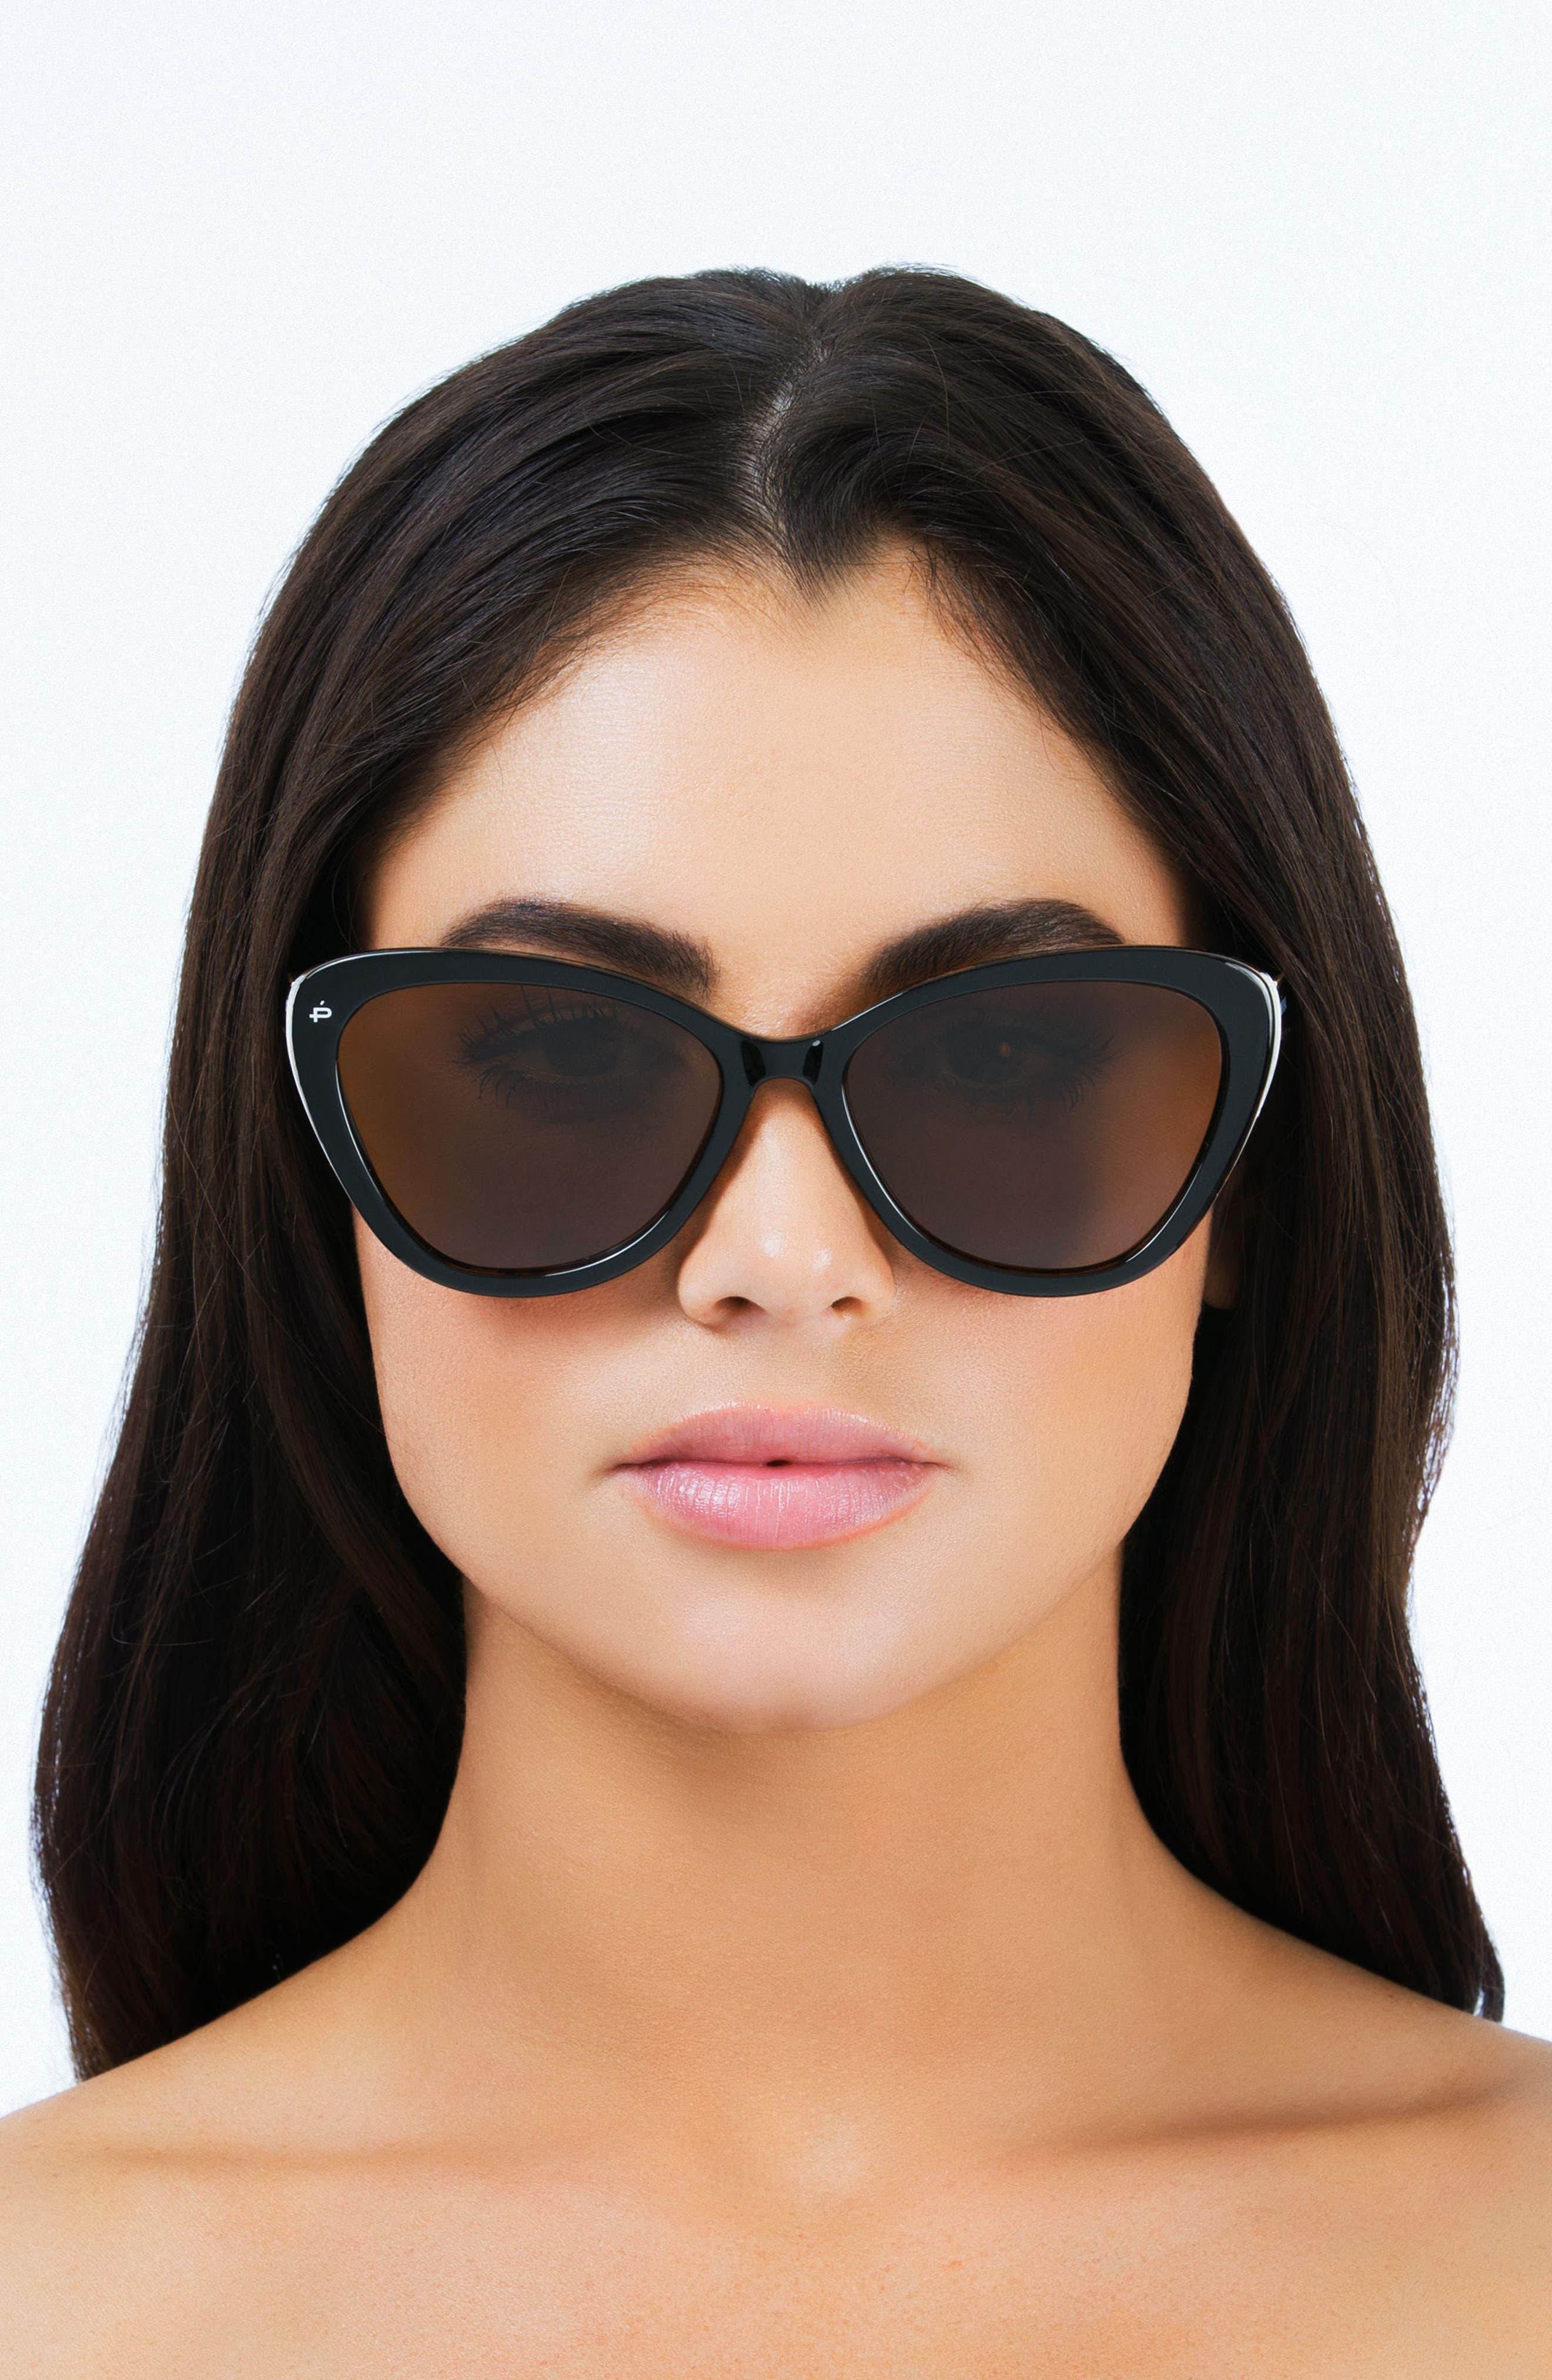 Privé Revaux The Hepburn 56mm Cat Eye Sunglasses,                             Alternate thumbnail 6, color,                             BLACK